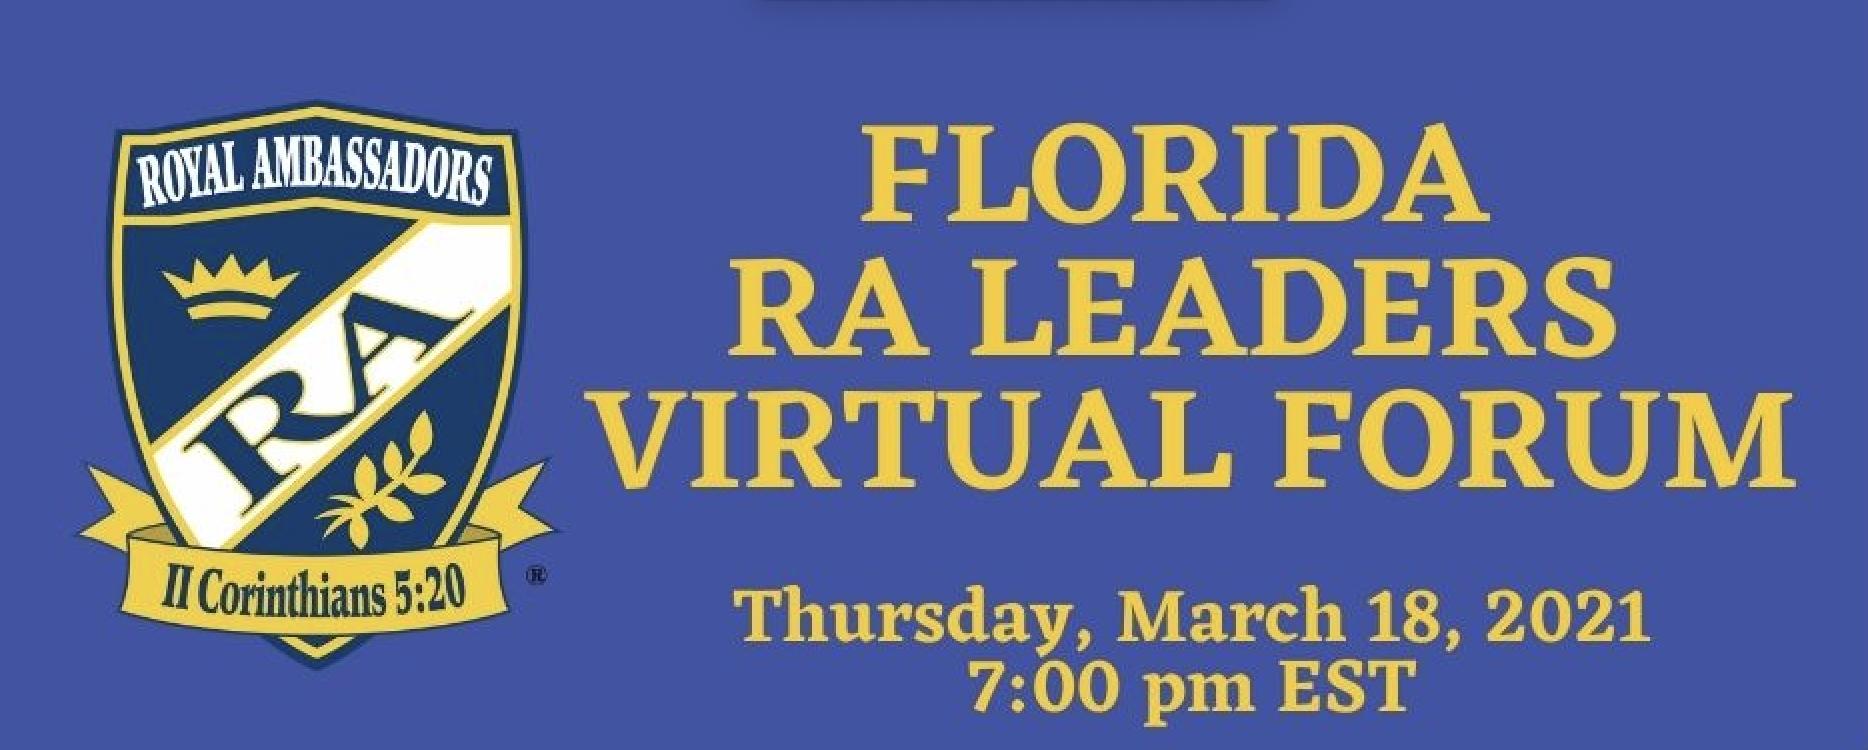 RA Leaders, Virtual Forum